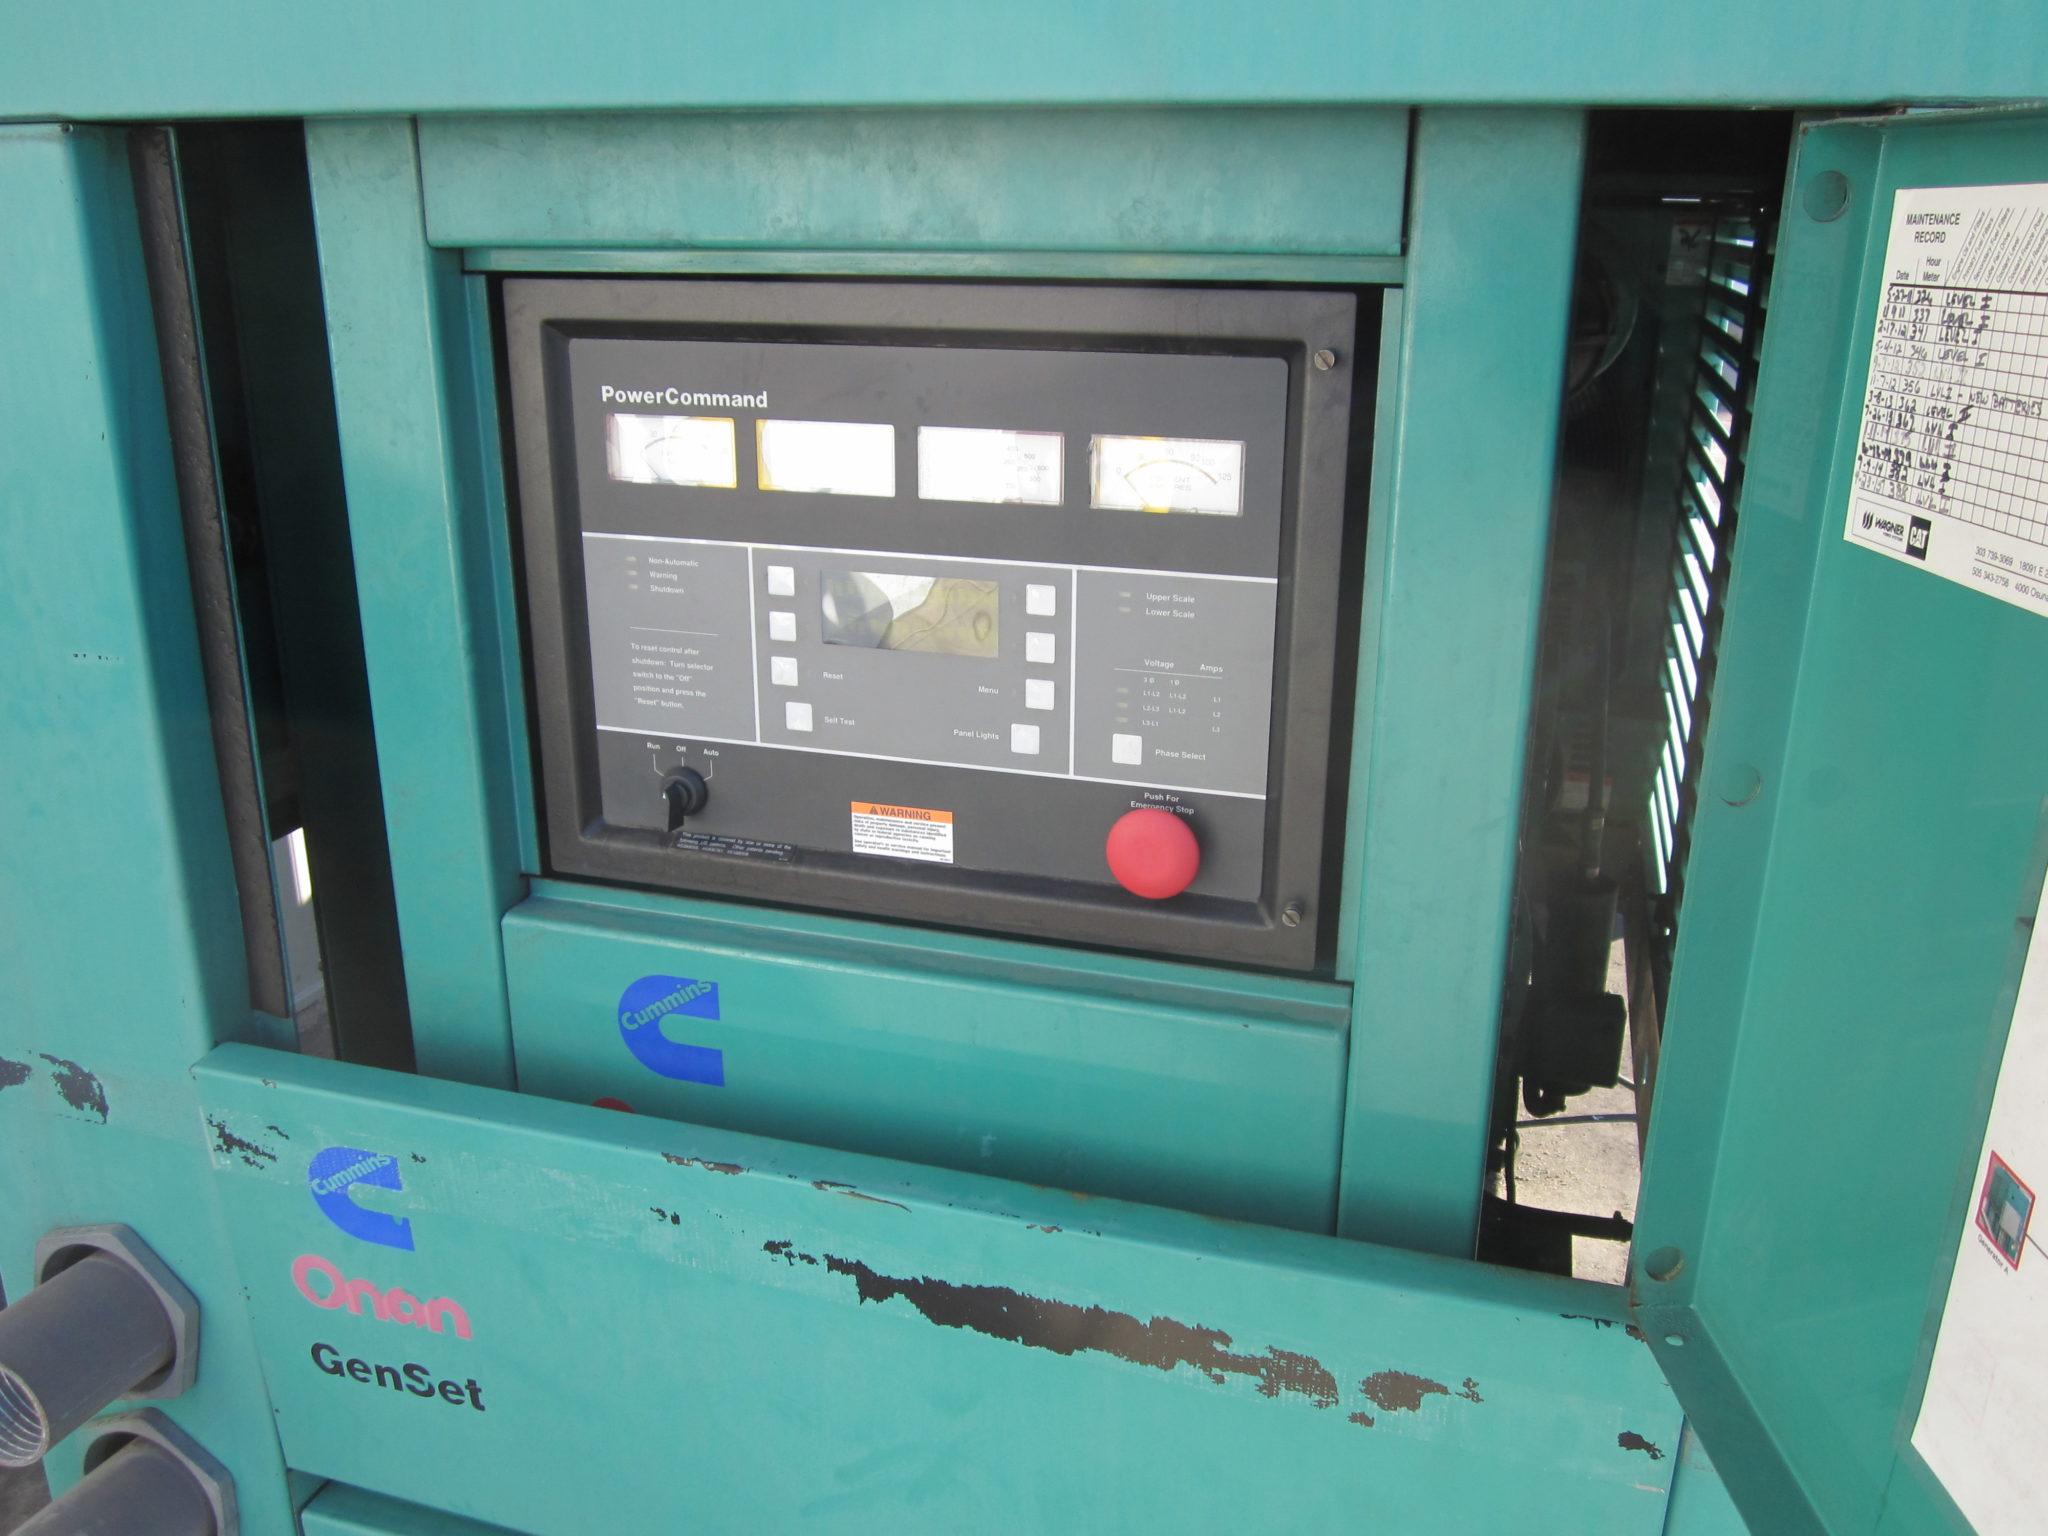 _400 kW Cummins Onan Generator, 650 Gallon Base Fuel Tank, 12 Lead  Reconnectable